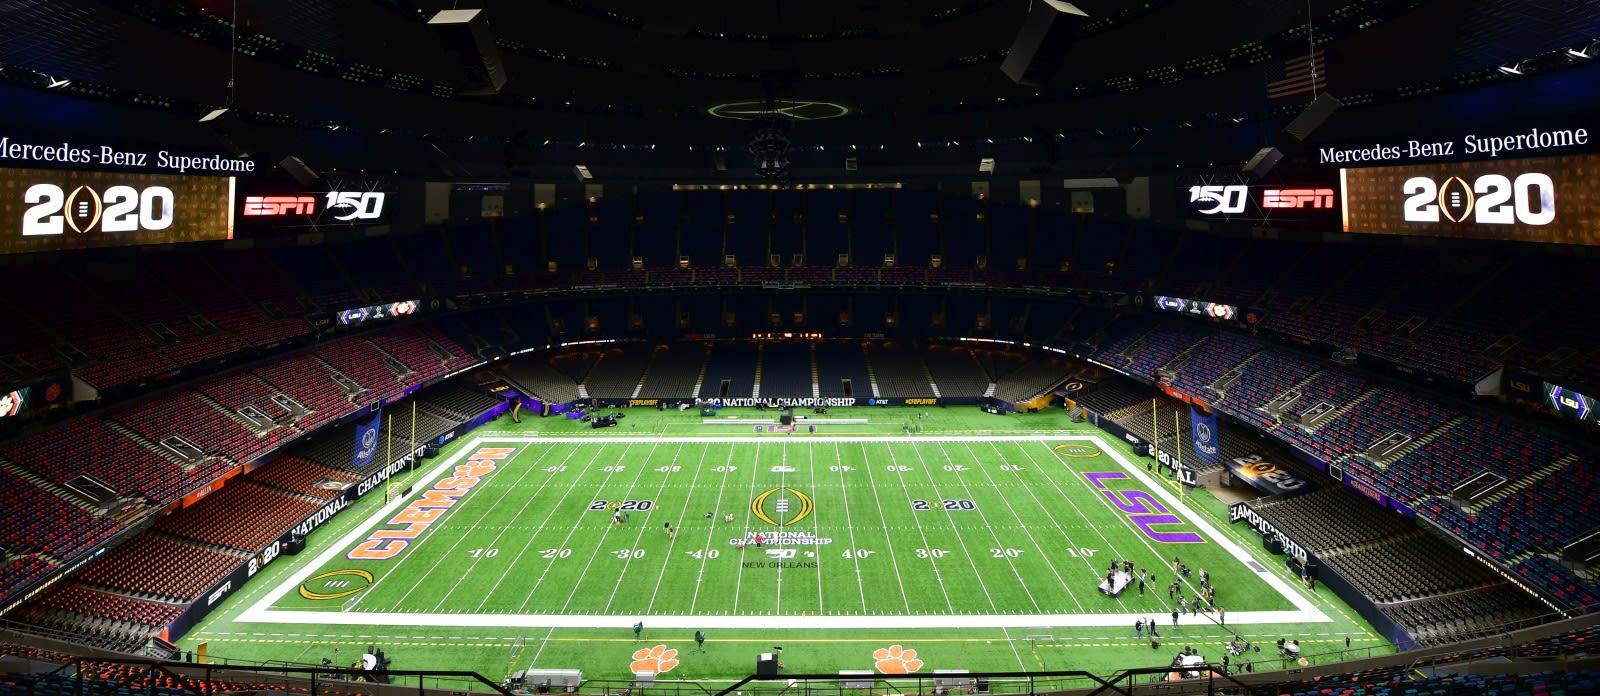 CFP National Championship - January 12, 2020